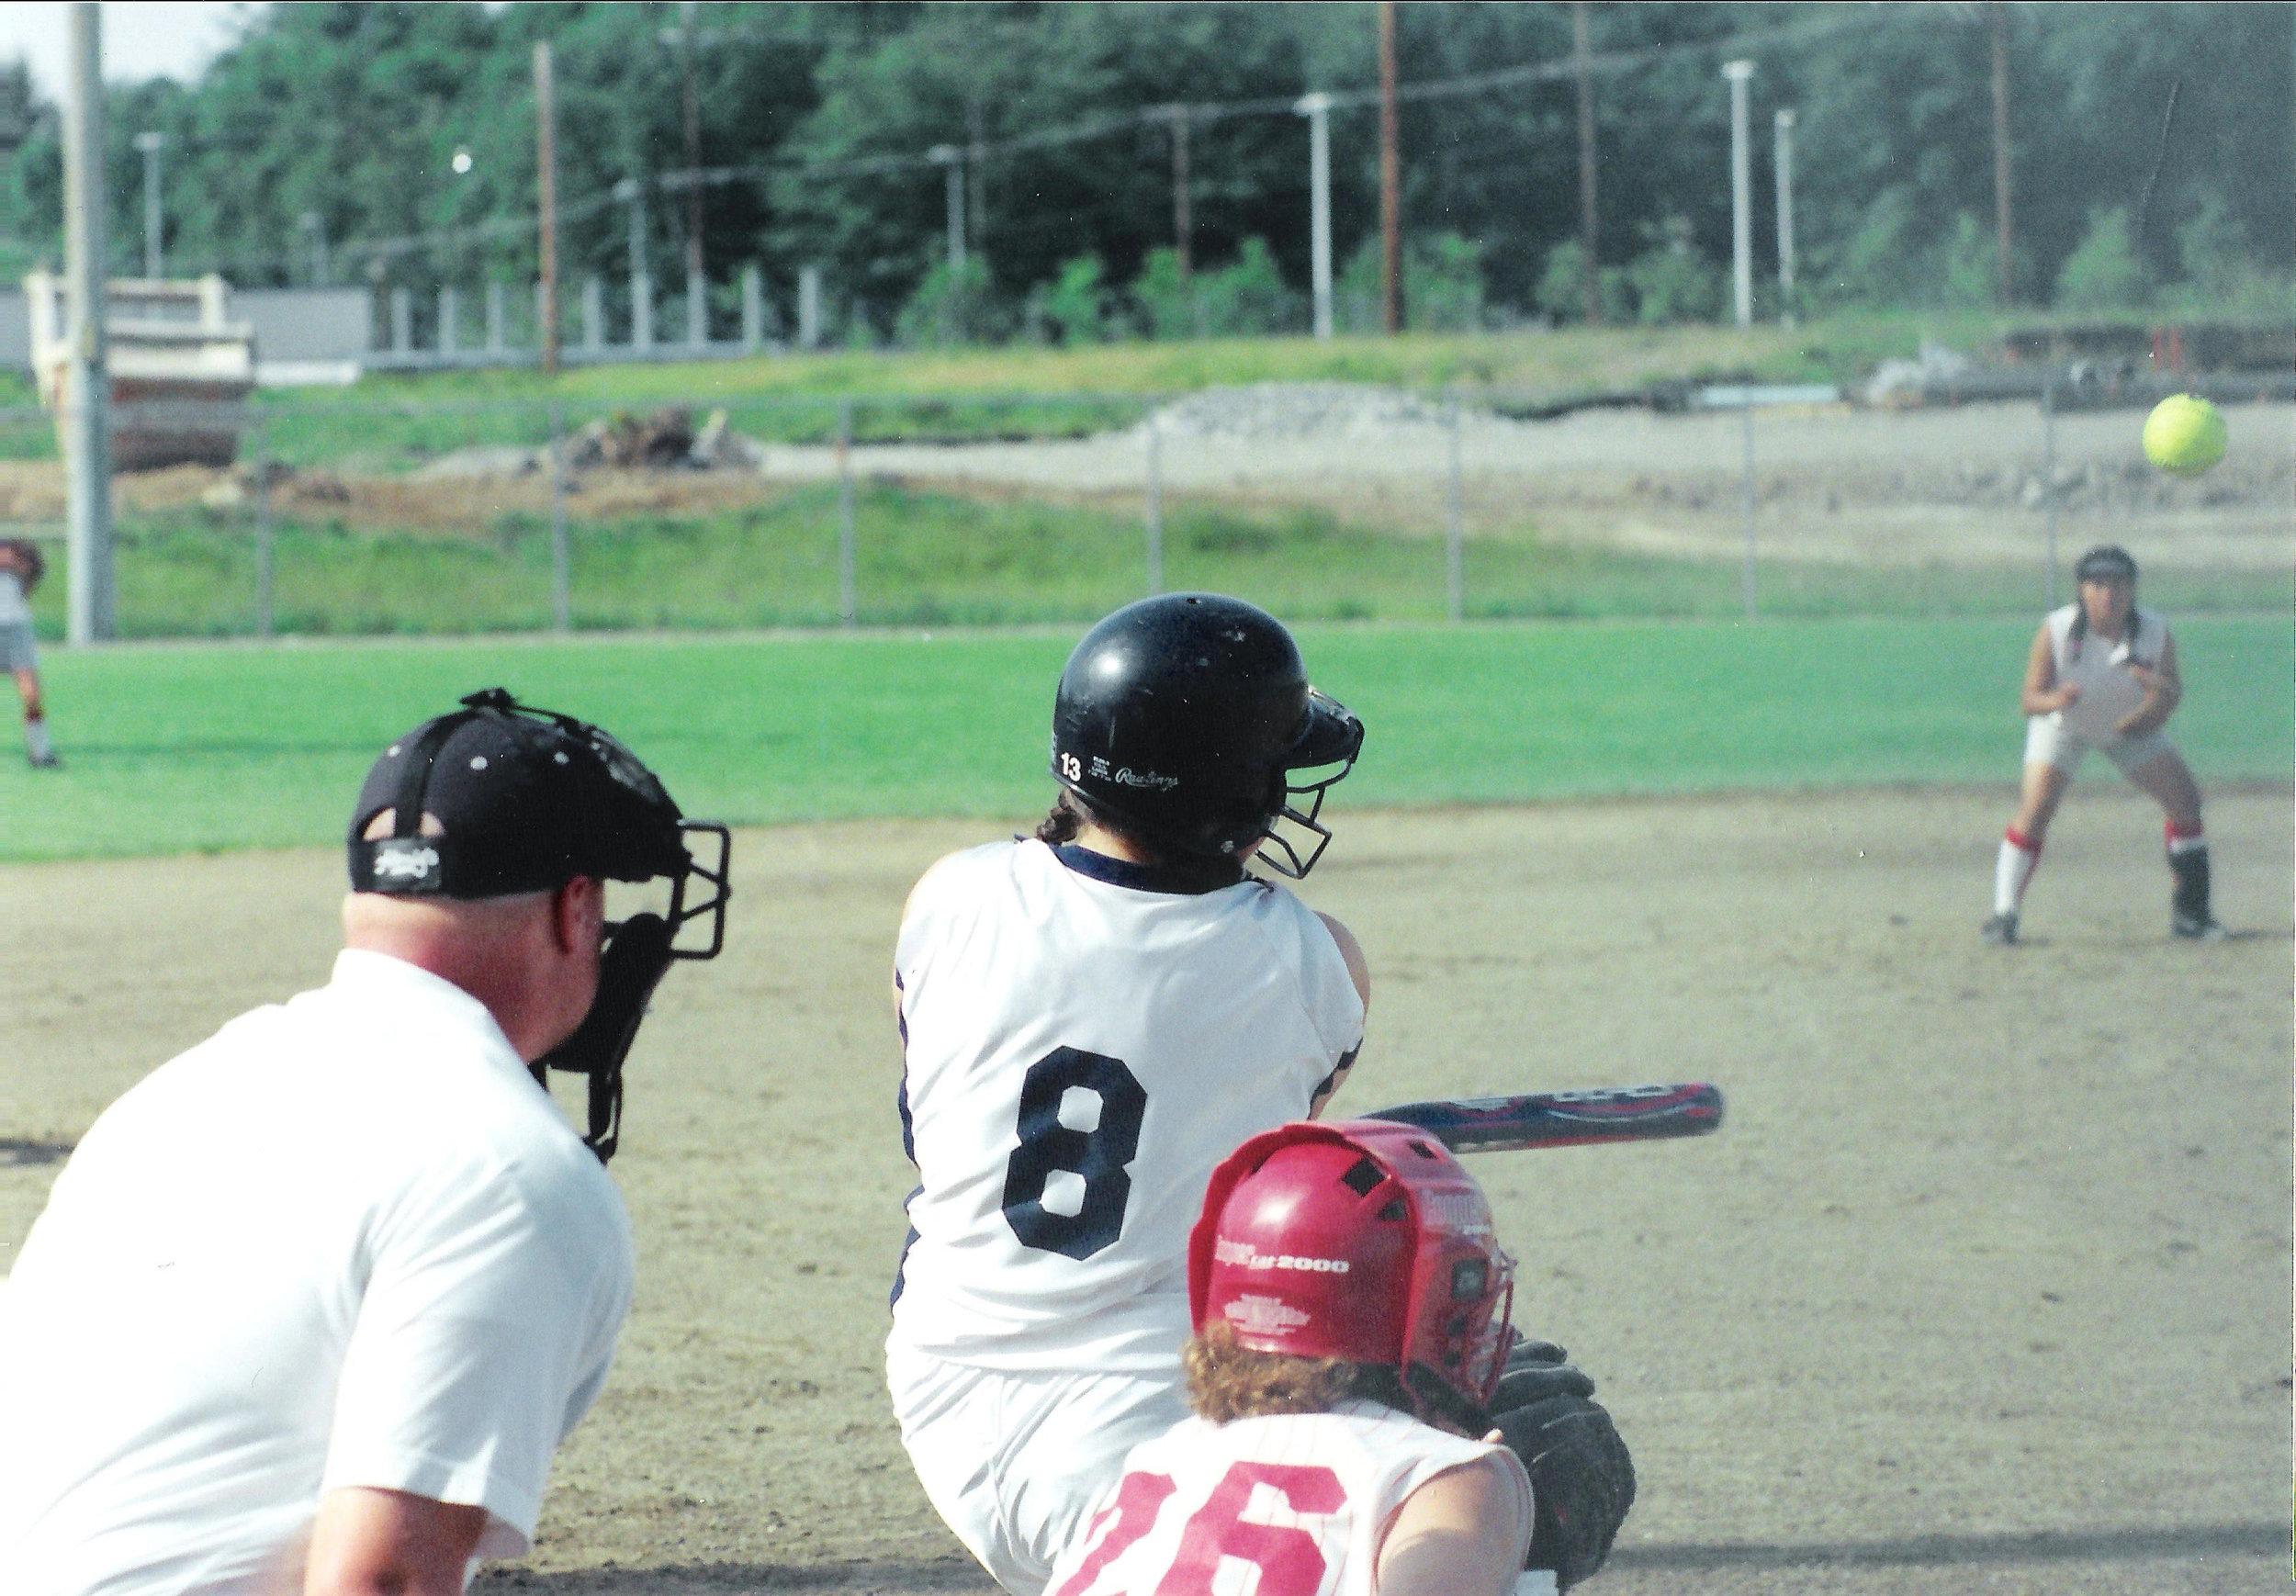 Amy (#8) playing softball.